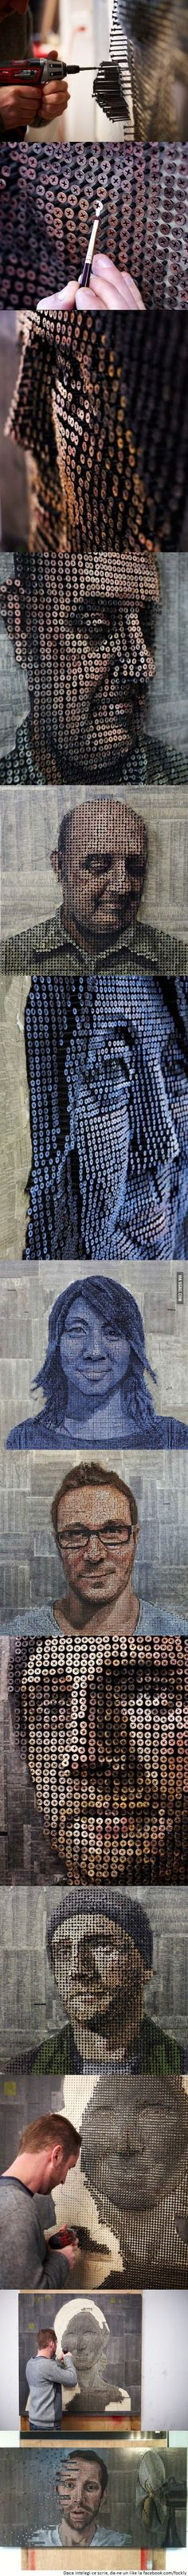 Asombrosos retratos en 3D hechos con tornillos de Andrew Myers